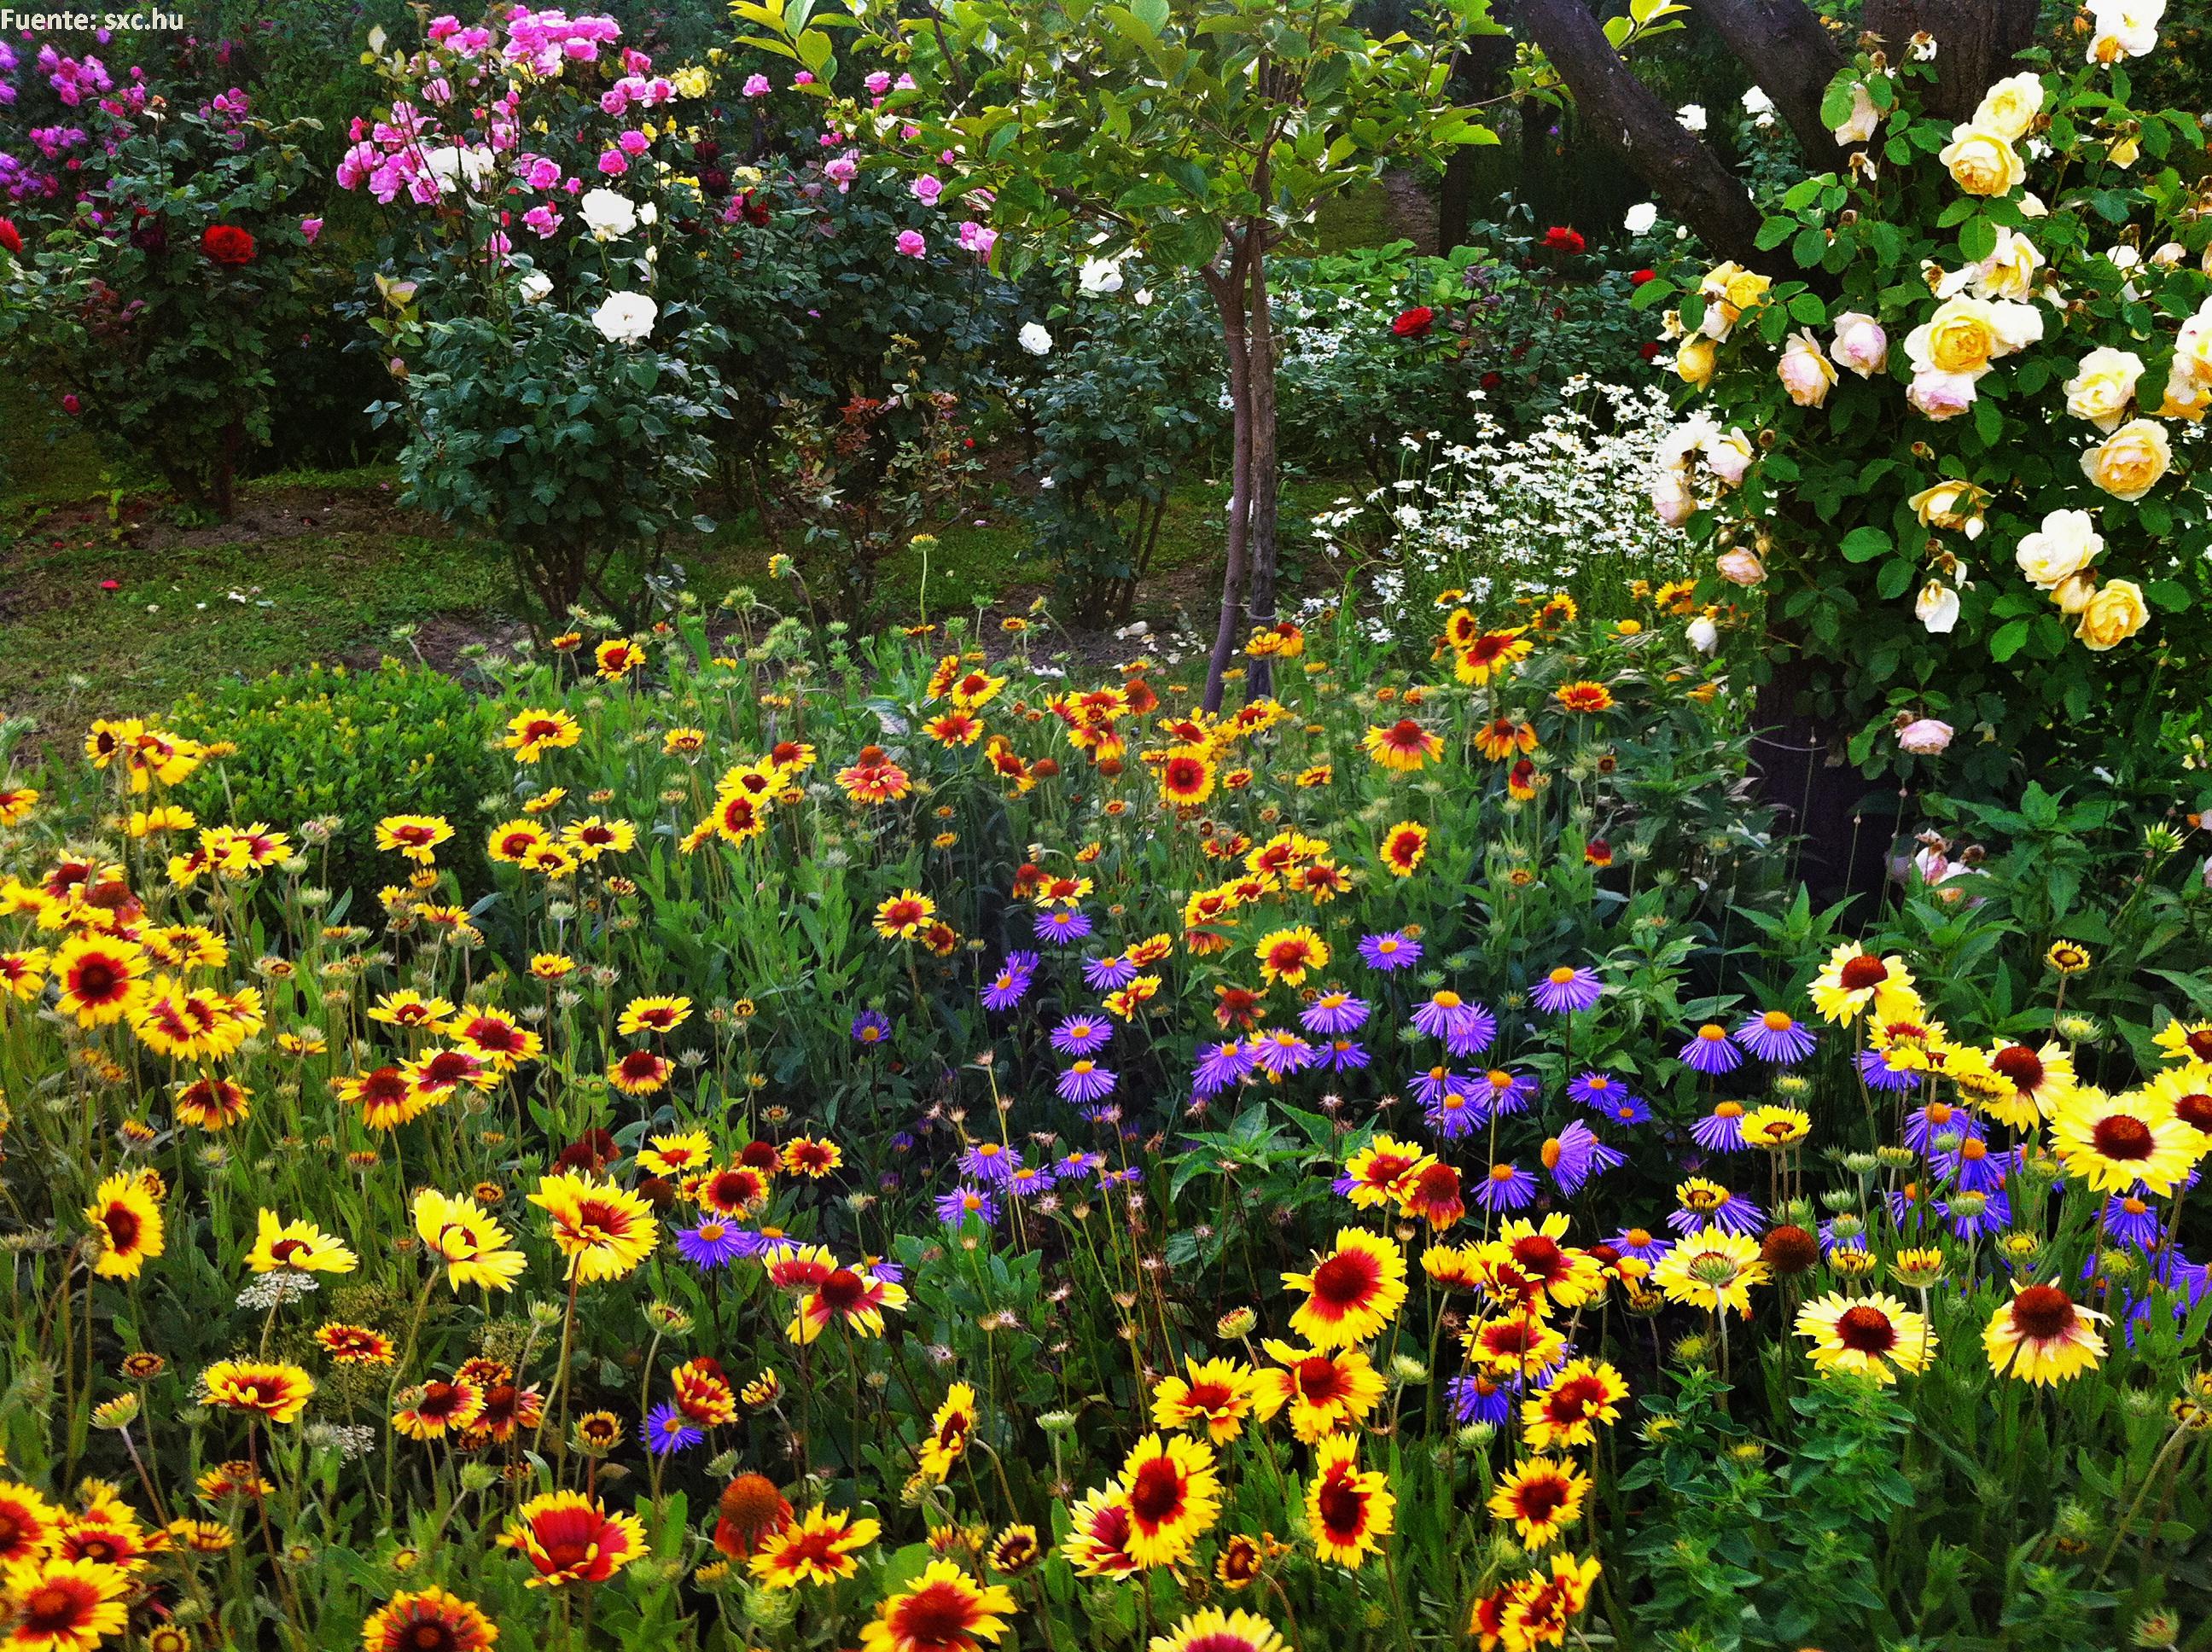 flores jardim primavera : flores jardim primavera:Paisaje de primavera – Currículum en línea. MINEDUC. Gobierno de